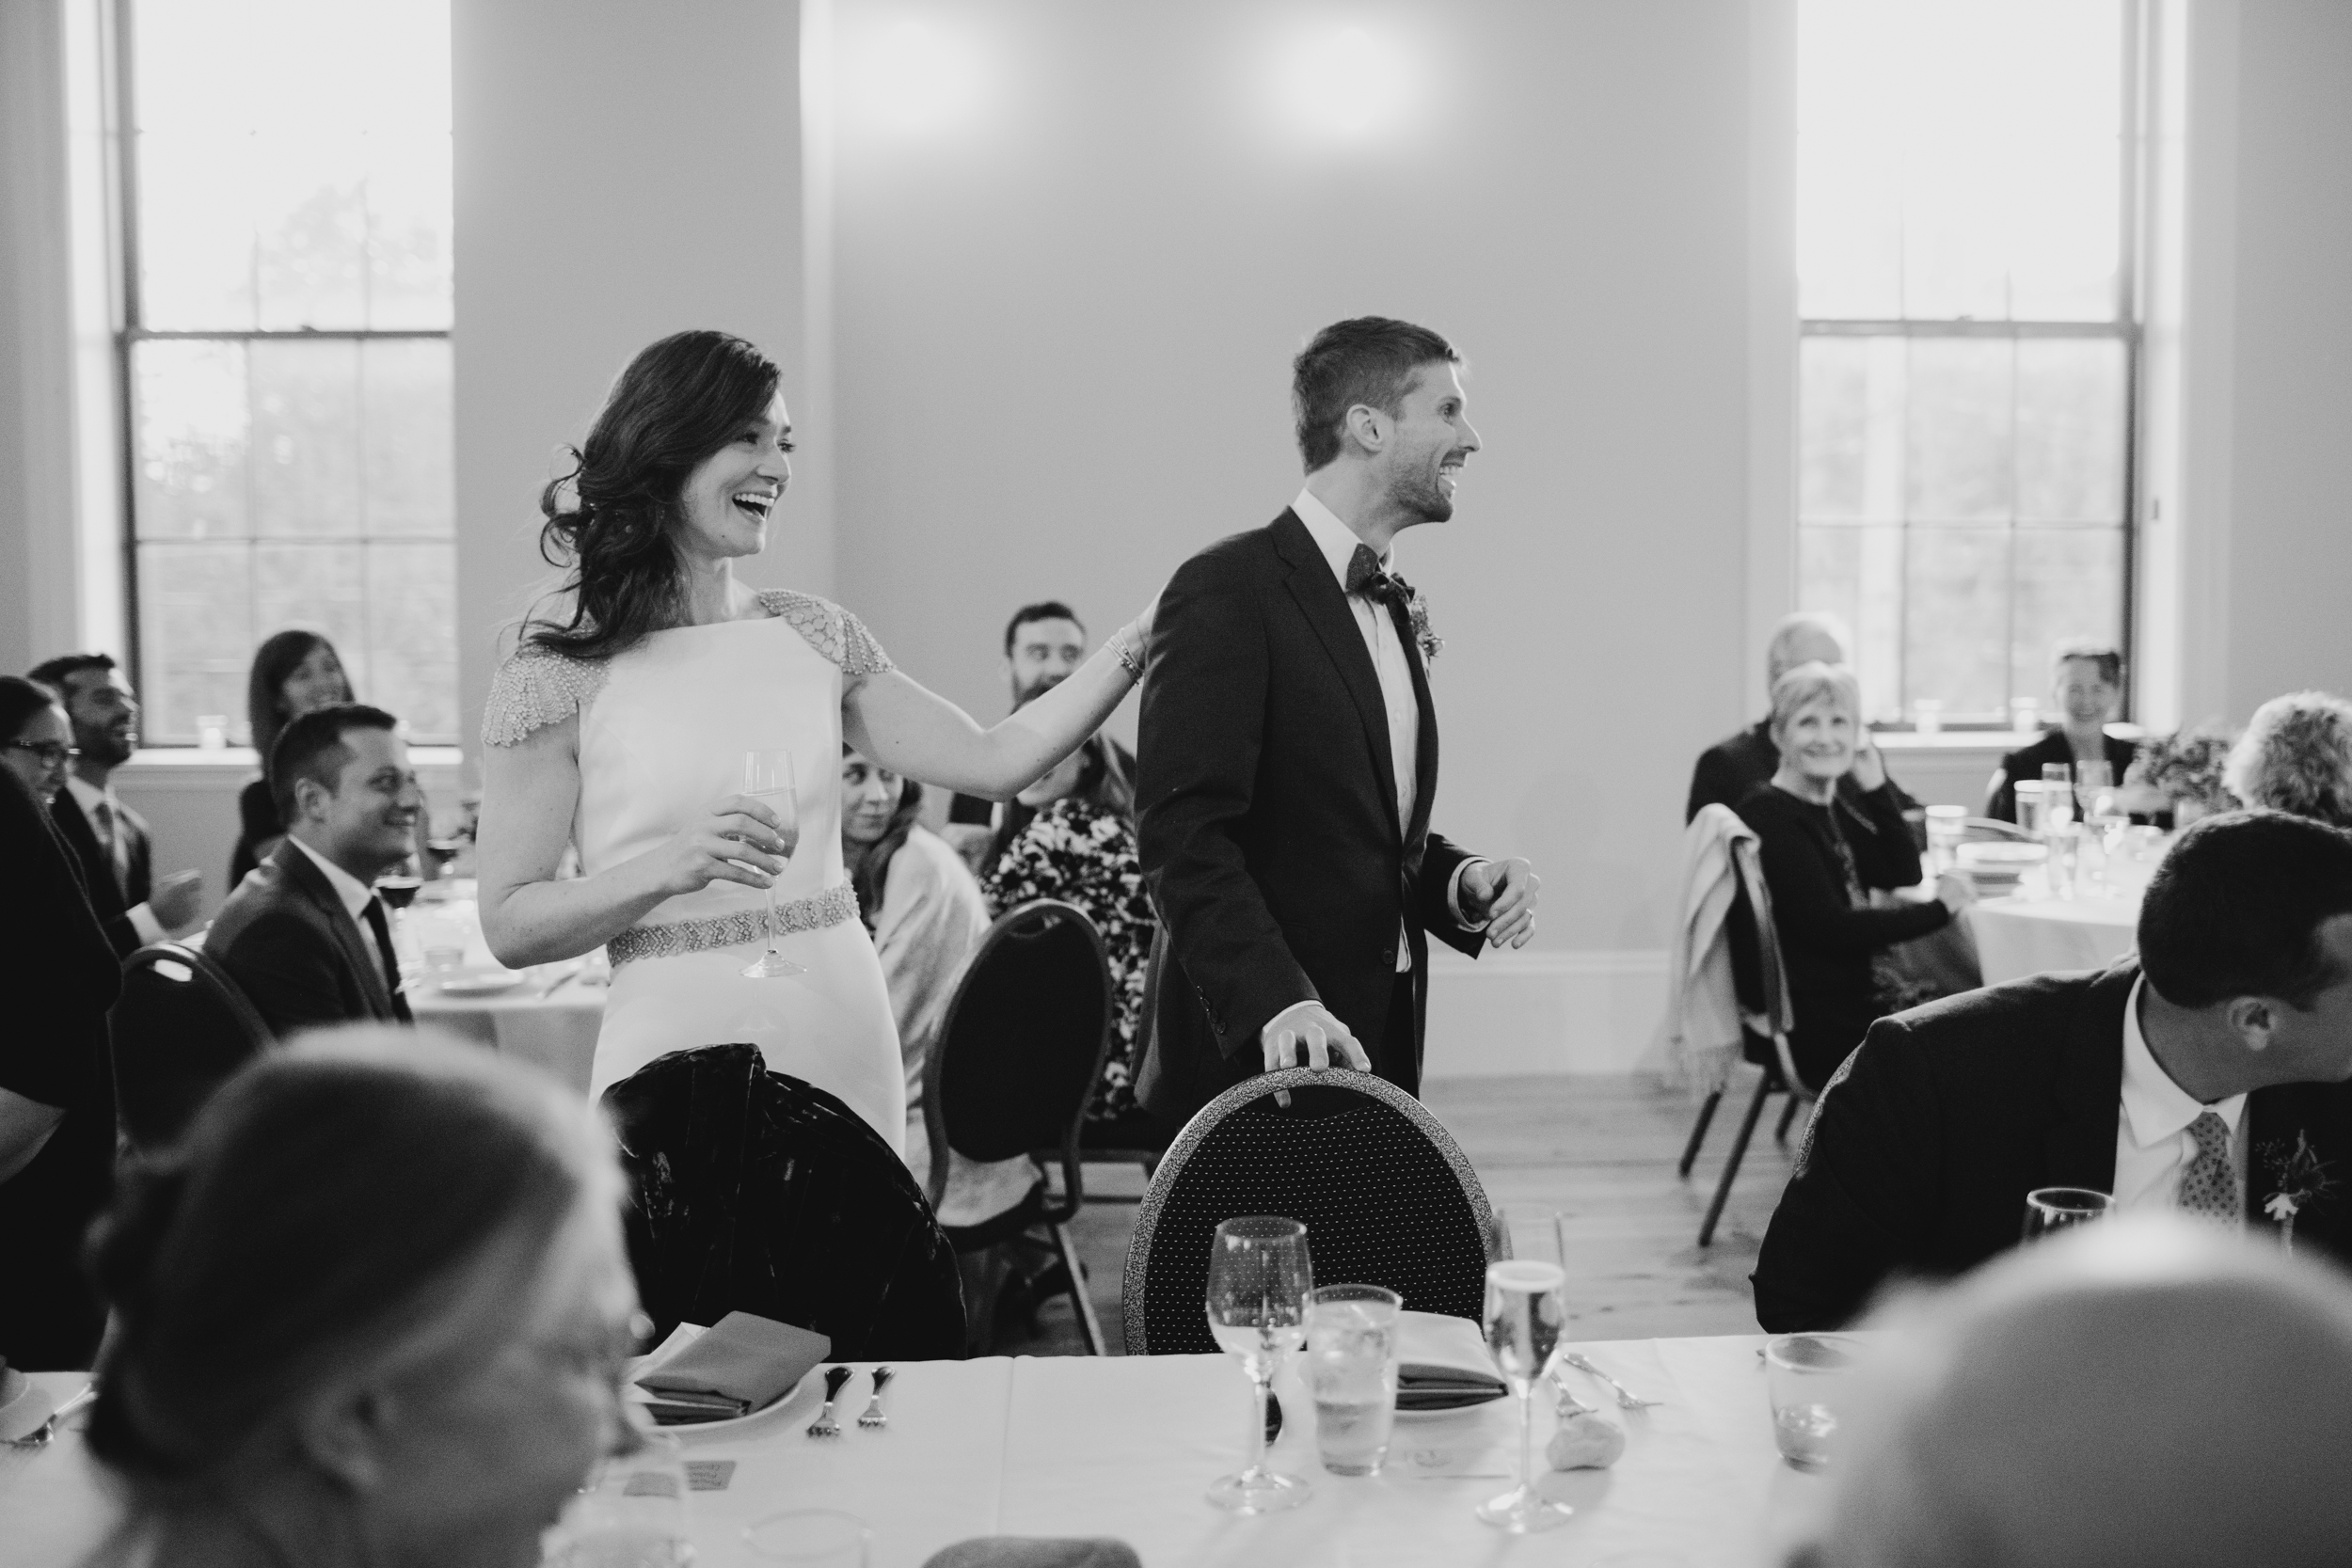 Mackenzie_Collins_Maine_wedding_in_Rockport_Union_hall_Nina_June_026.jpg